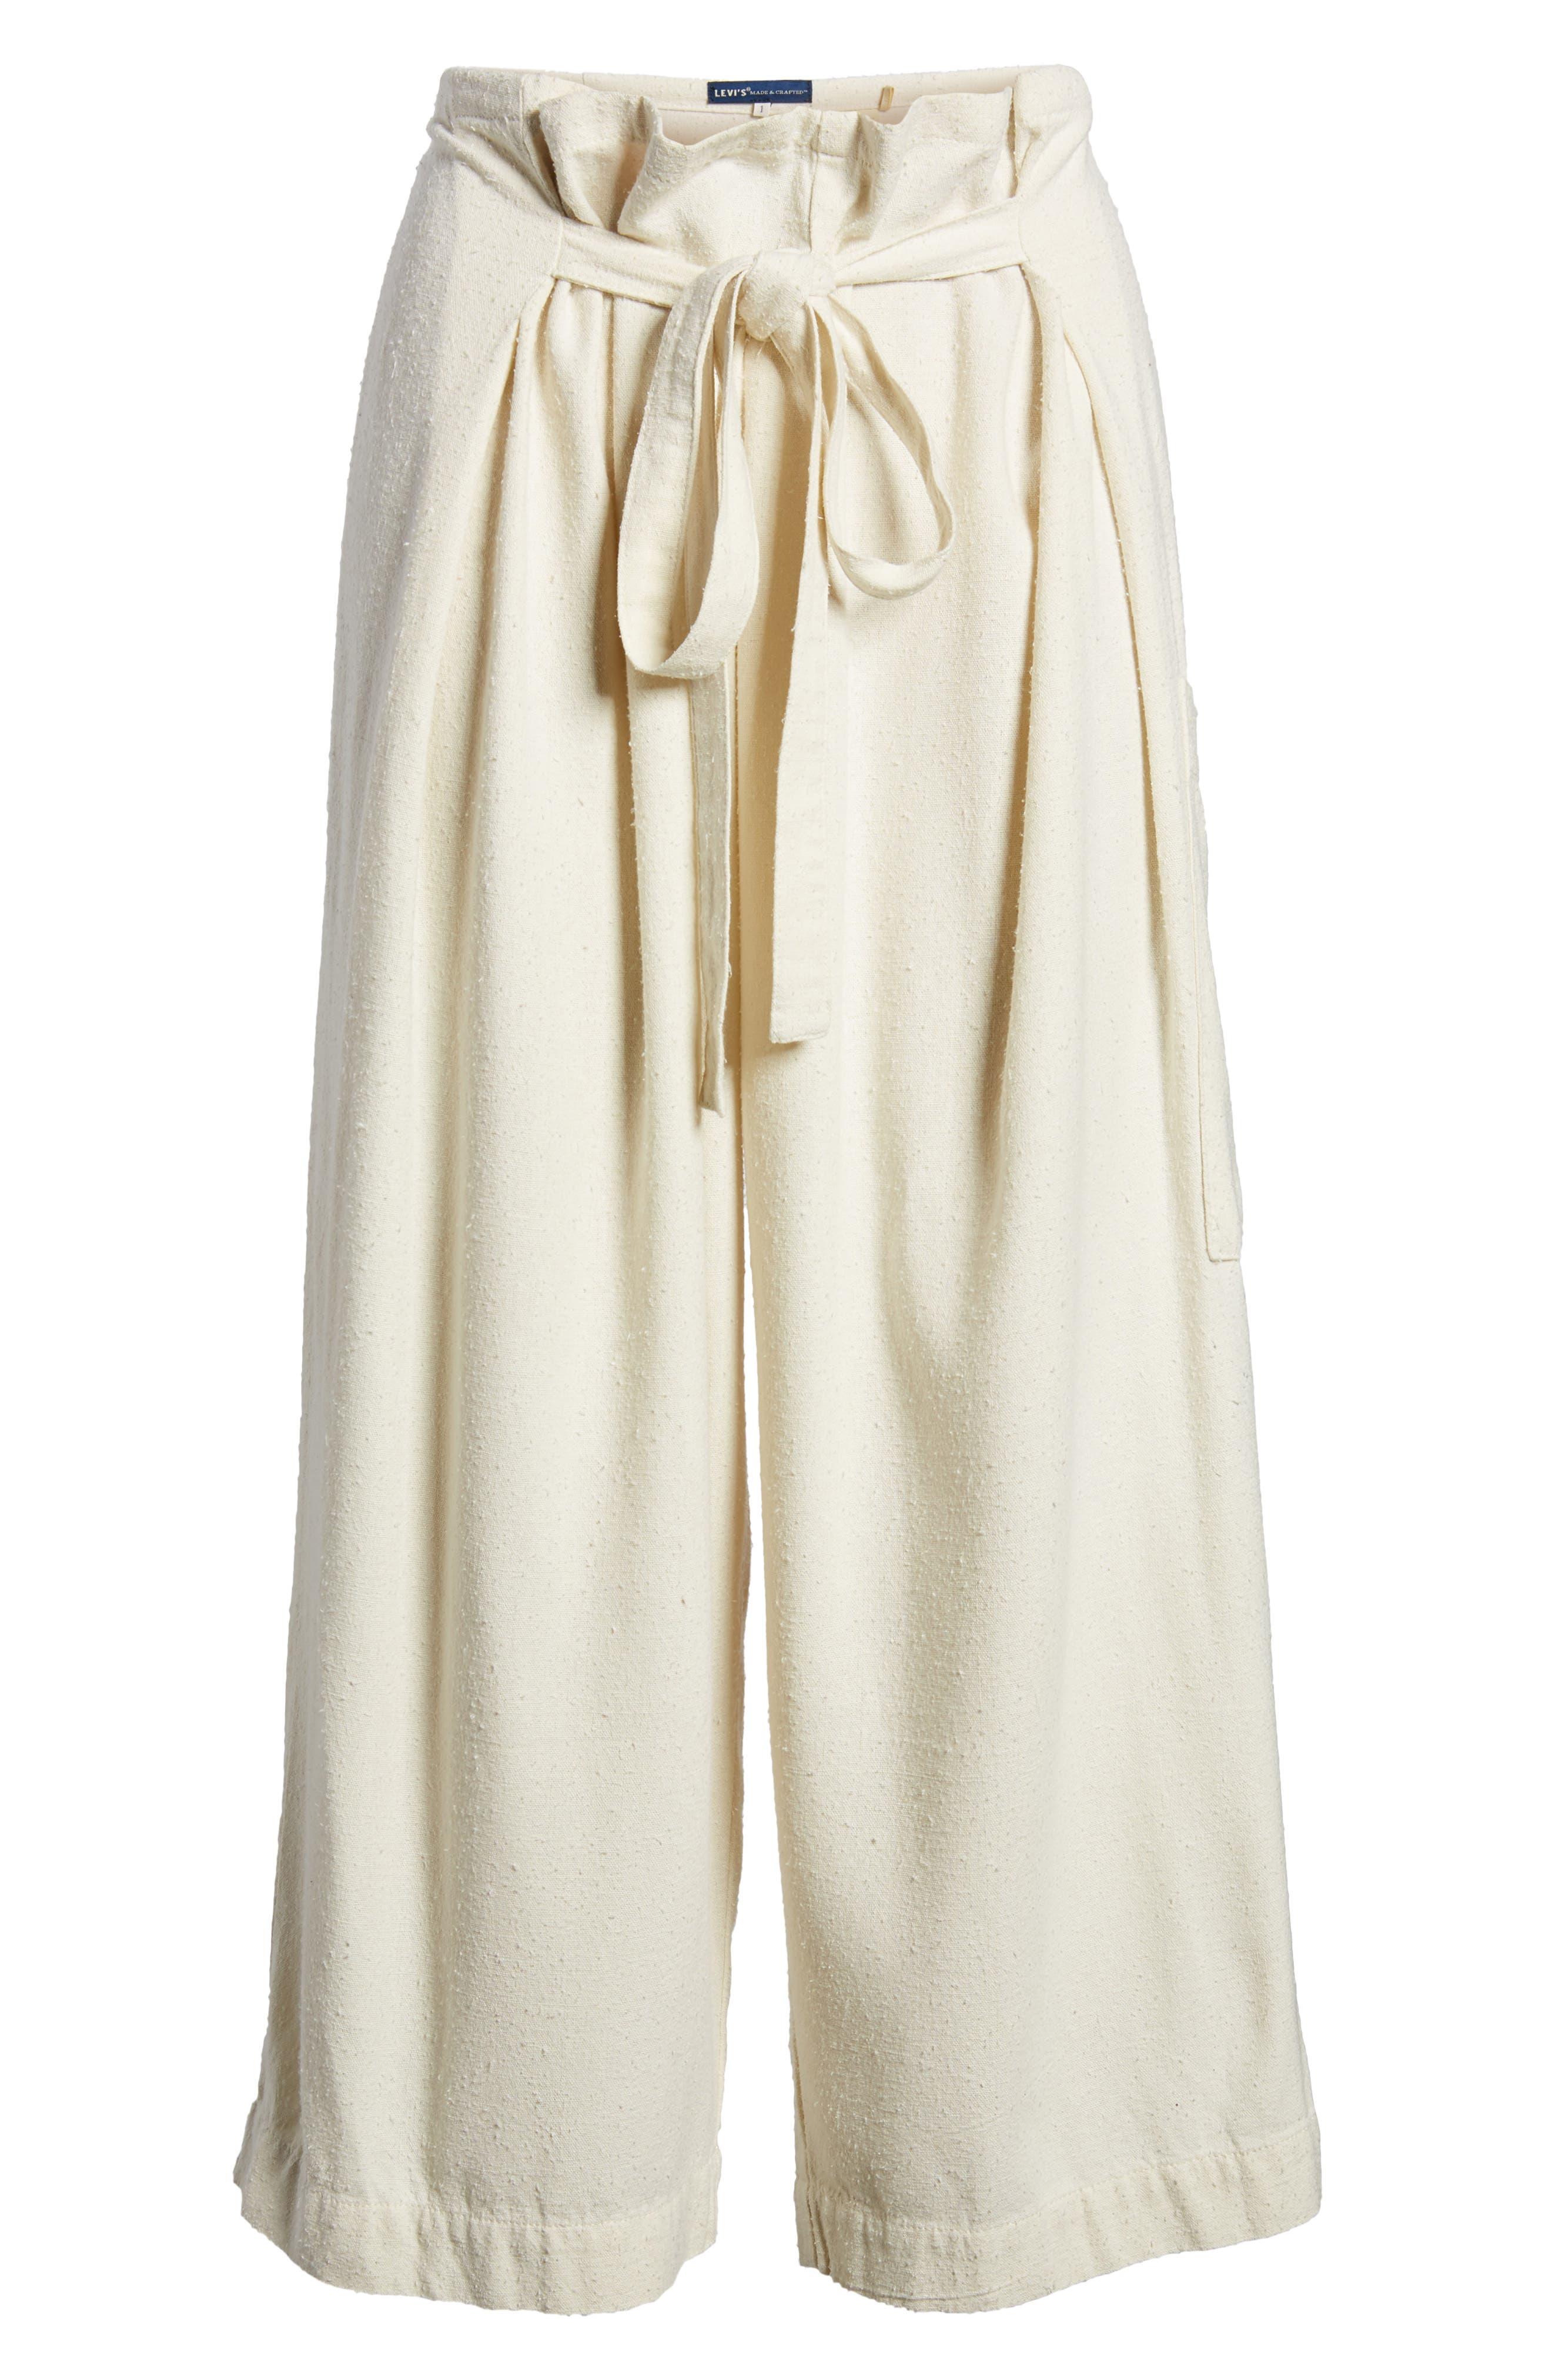 High Waist Crop Silk Beach Pants,                             Alternate thumbnail 7, color,                             100